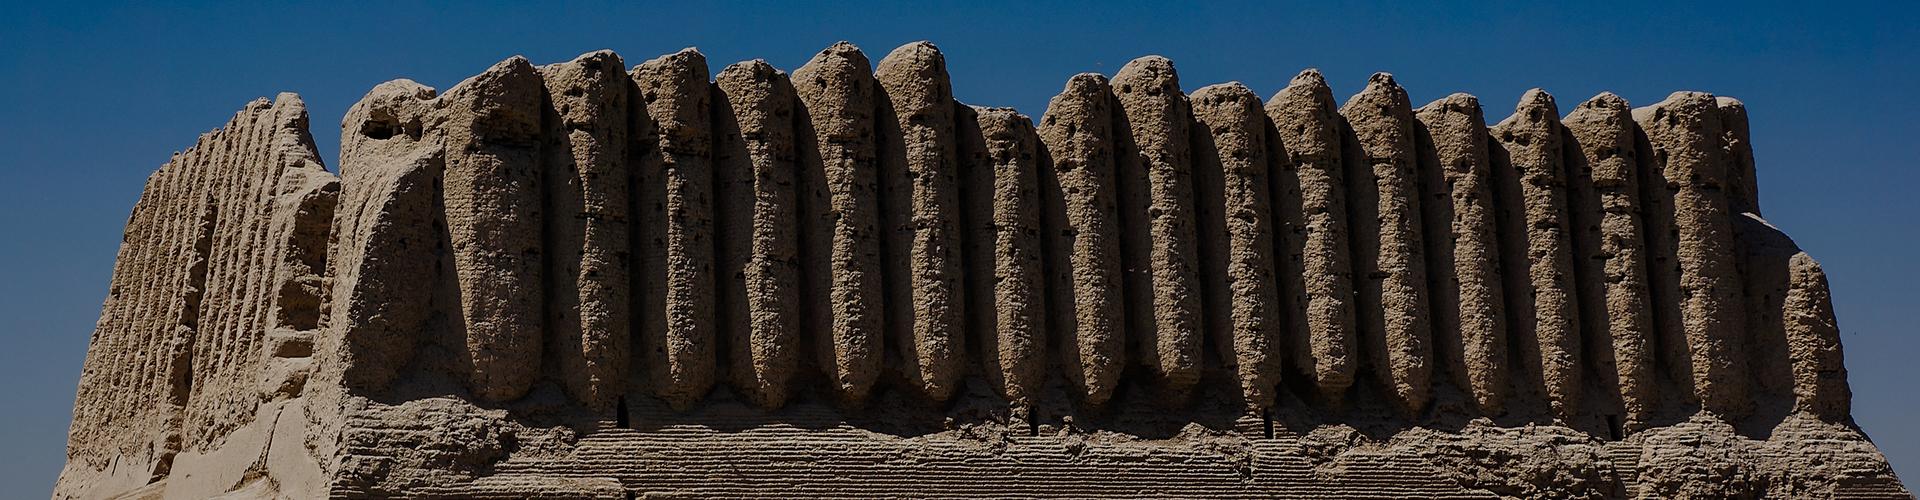 Landmark photograph of Turkmenistan